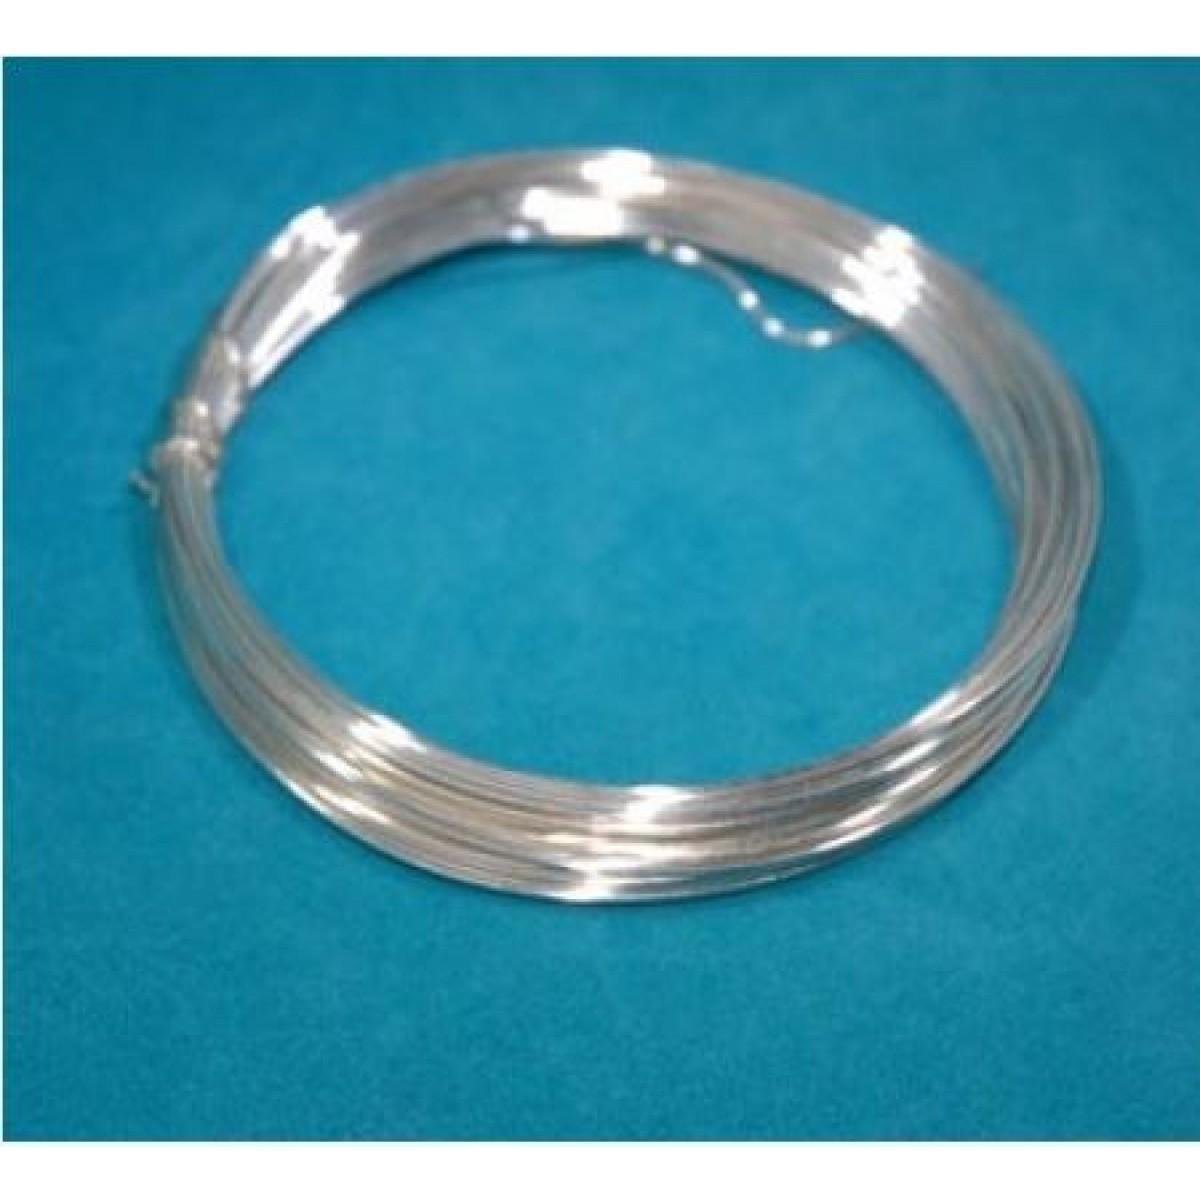 Versilberter kupferdraht 1mm elektronik f r jedermann for Silberdraht kaufen